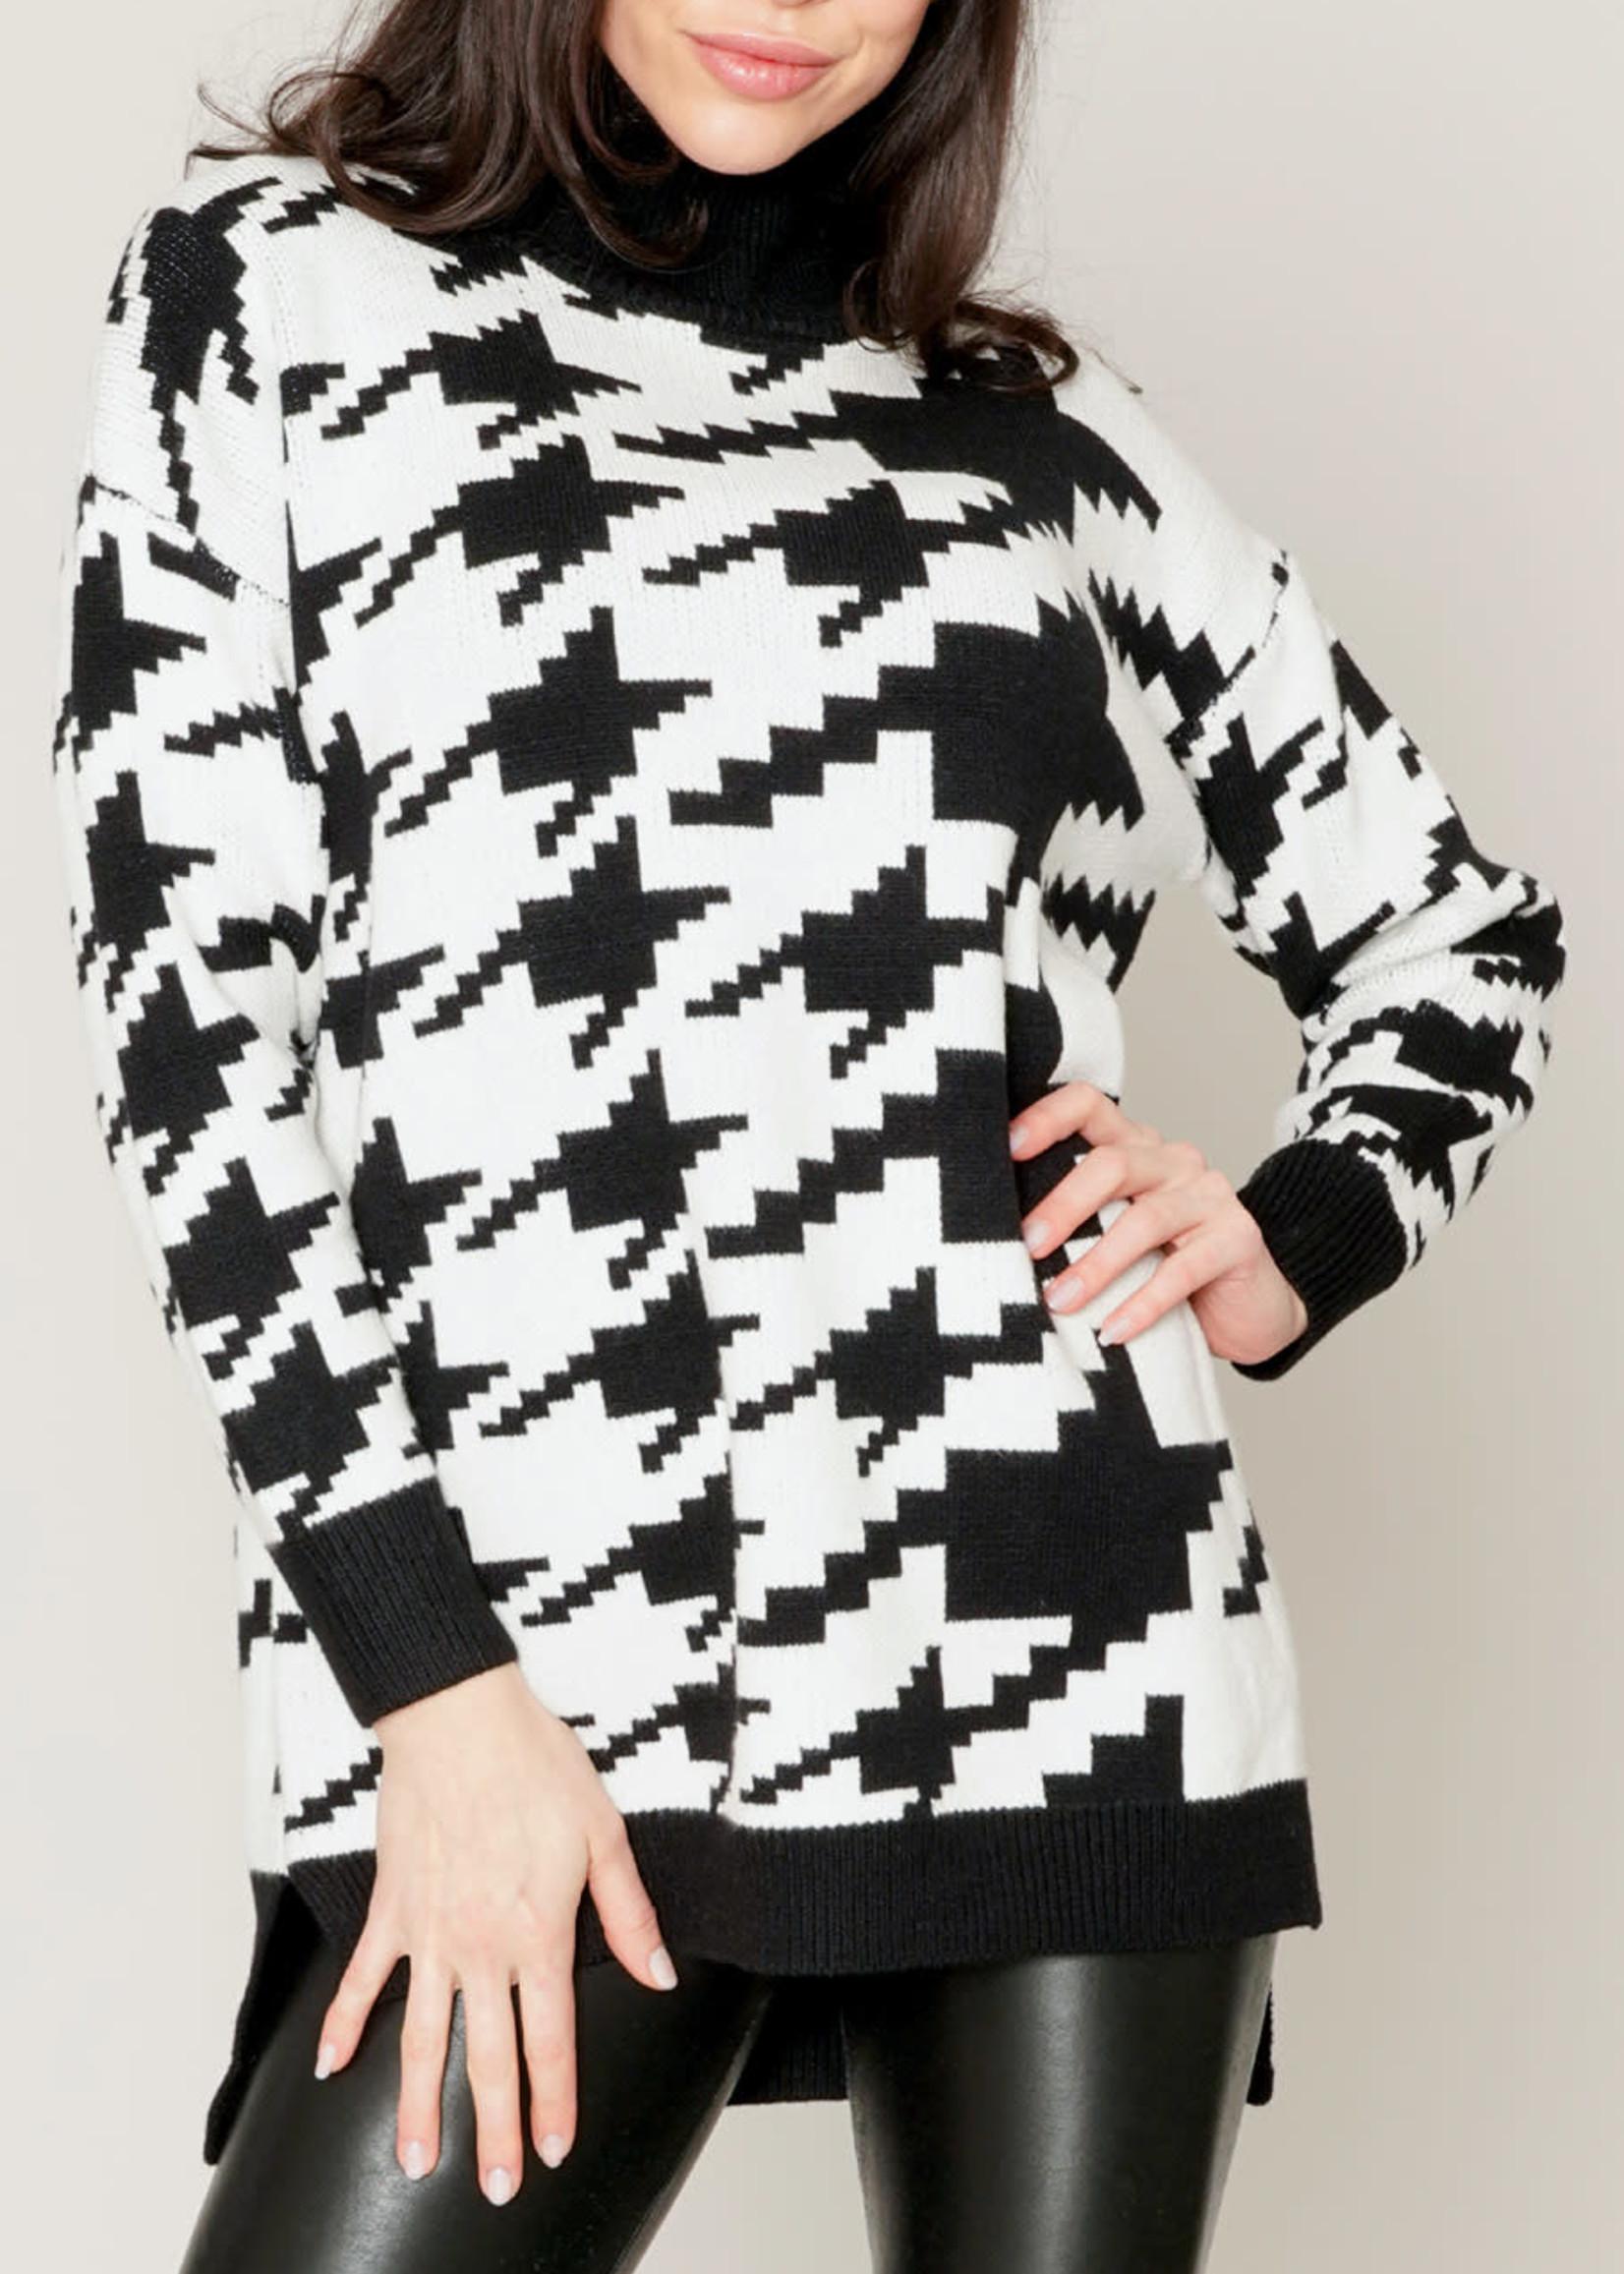 Funsport Funsport Houndstooth Sweater Black/White